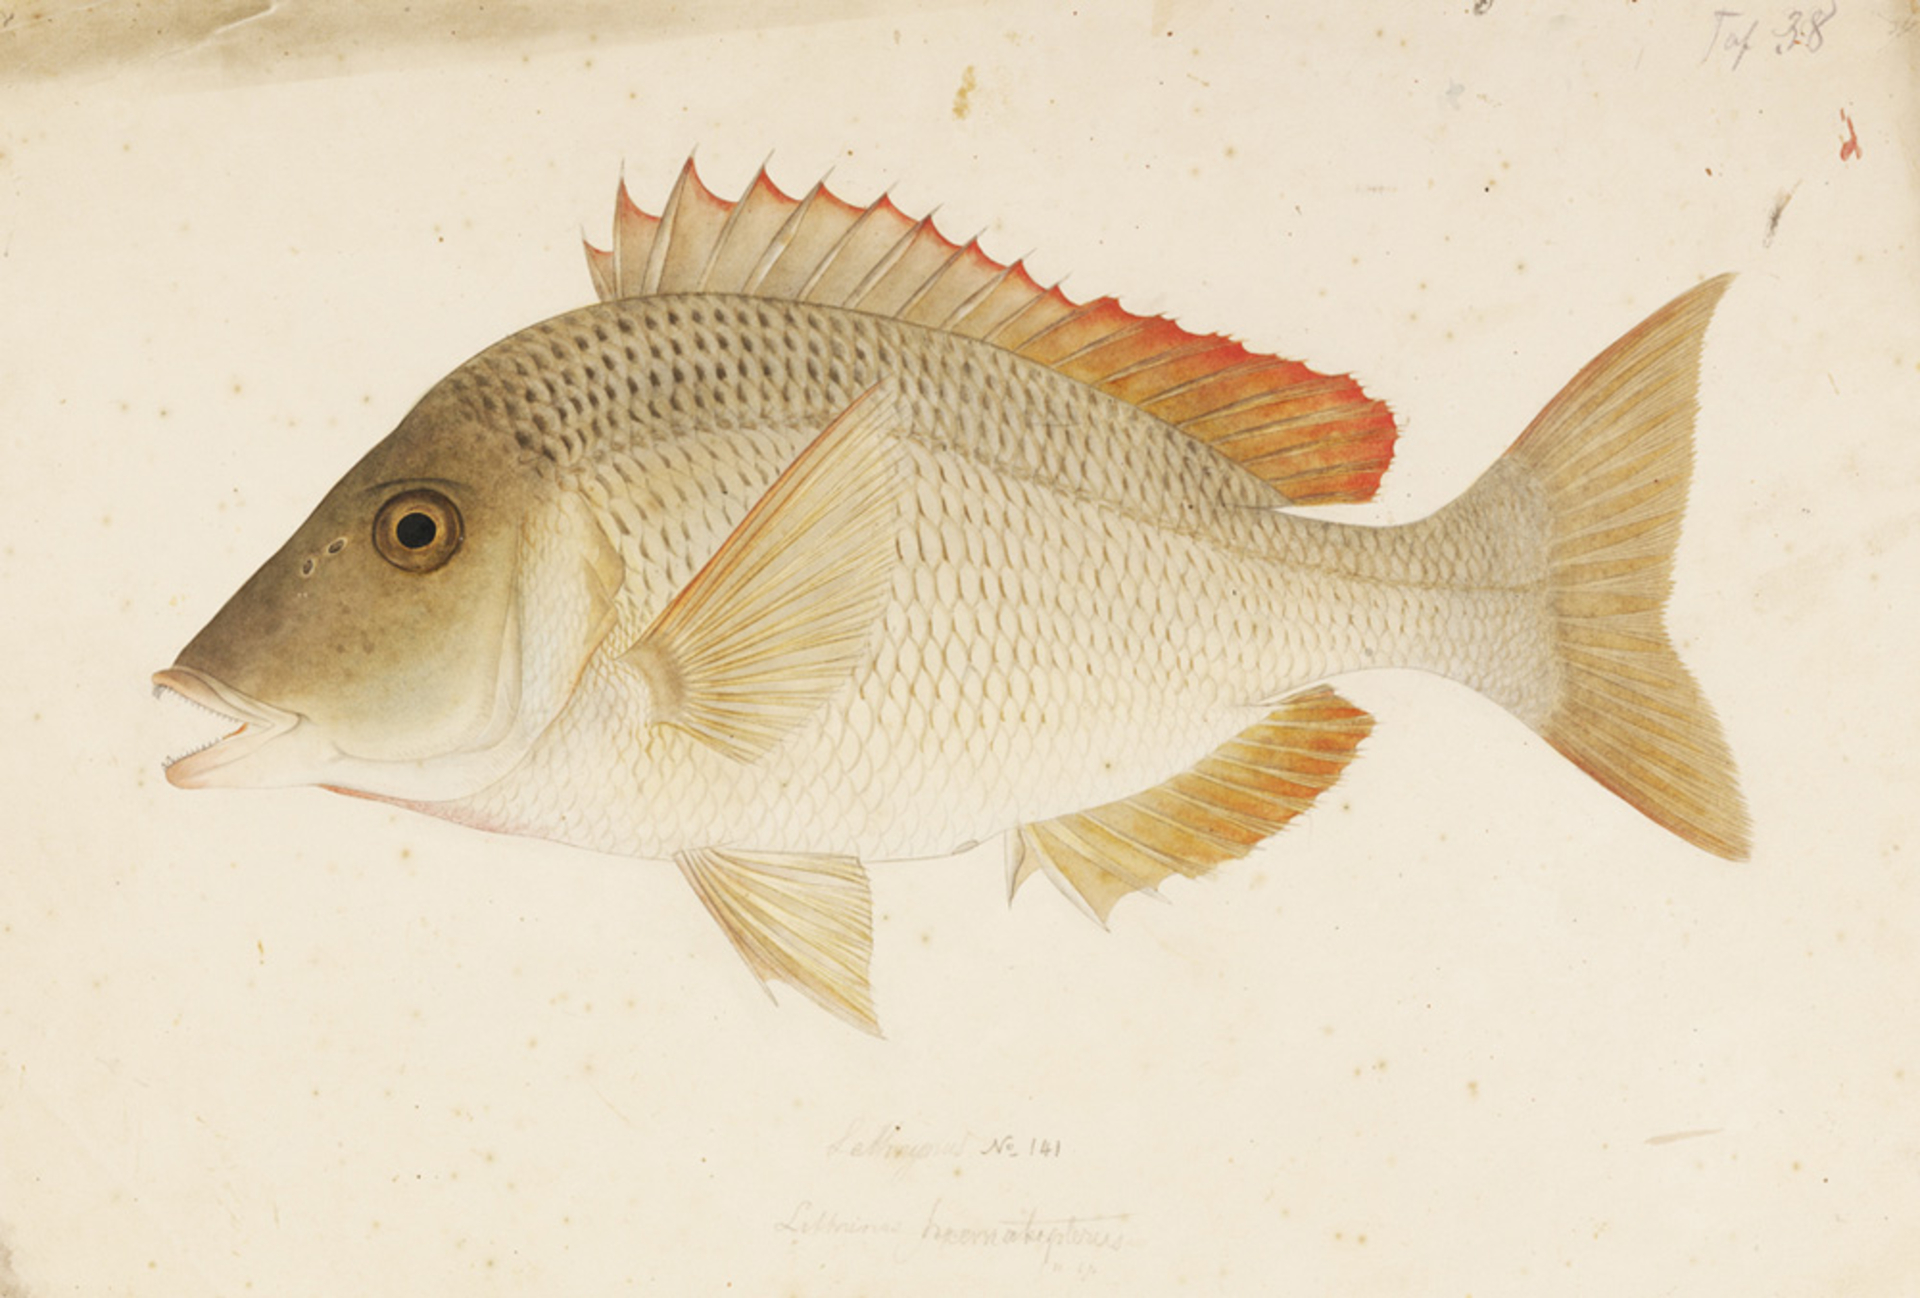 RMNH.ART.459   Lethrinus haematopterus